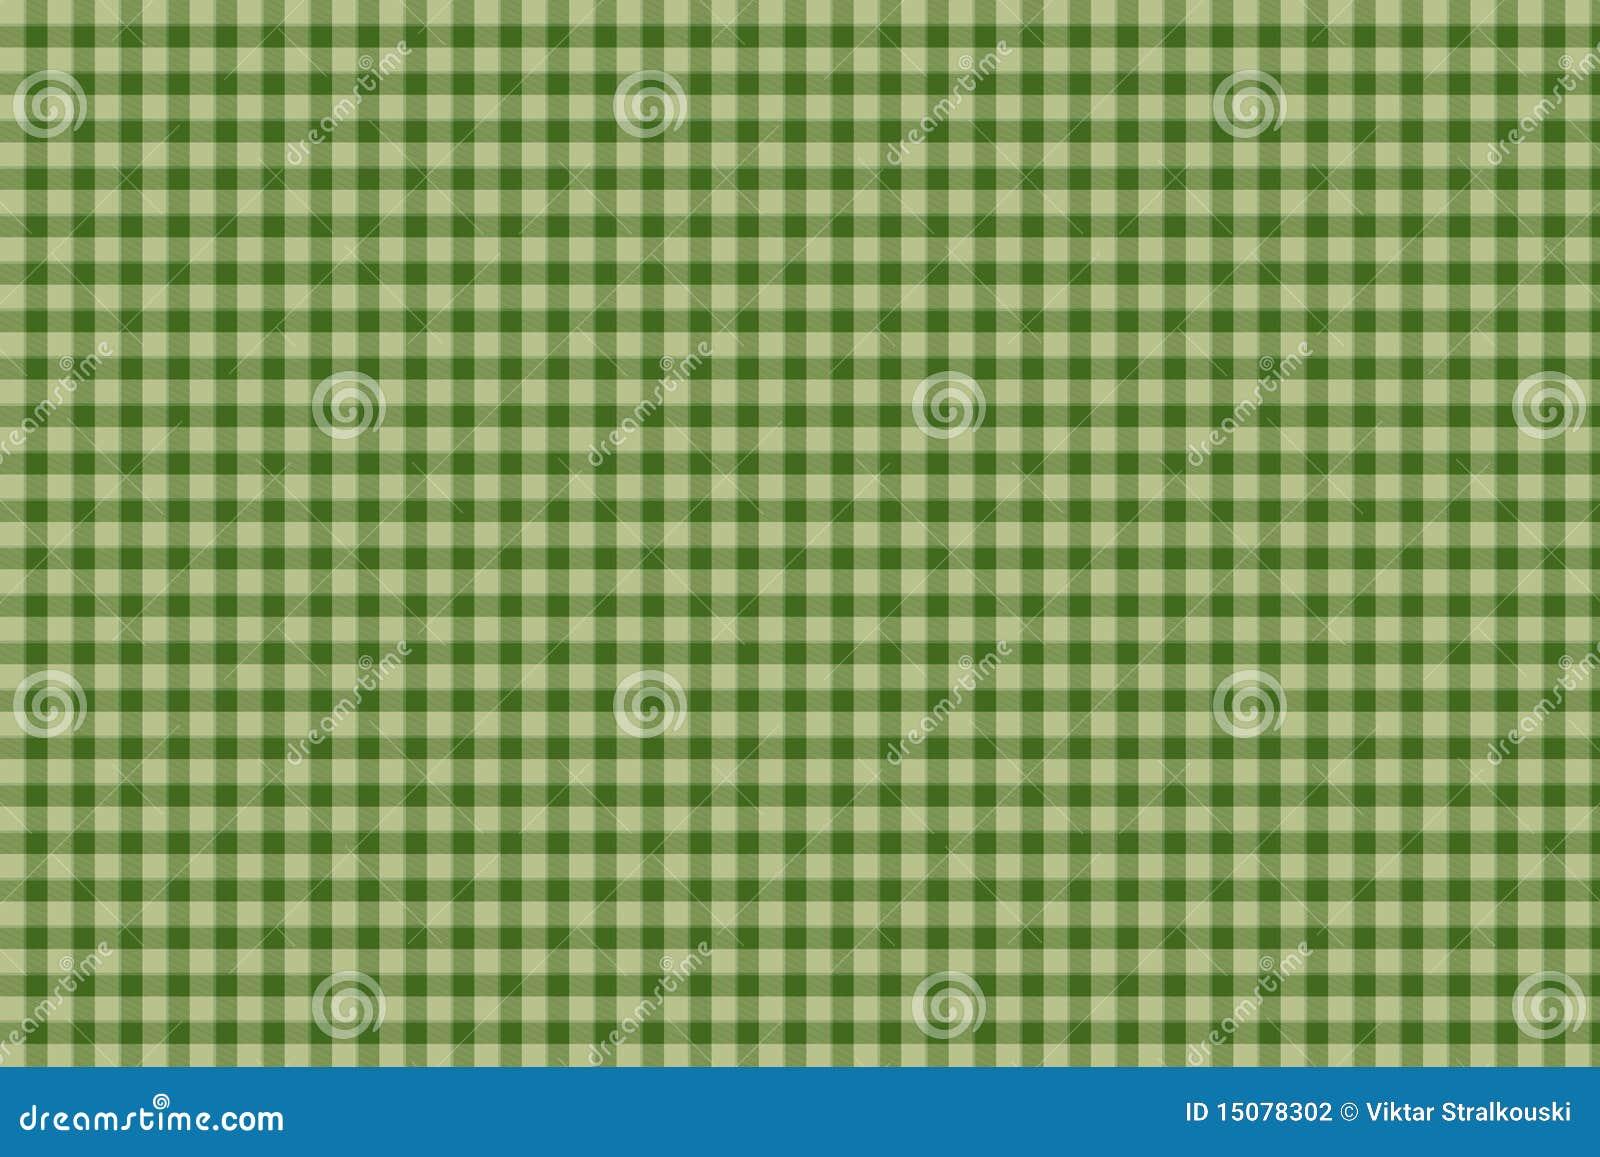 Green Plaid Gingham Background Stock Illustration Image